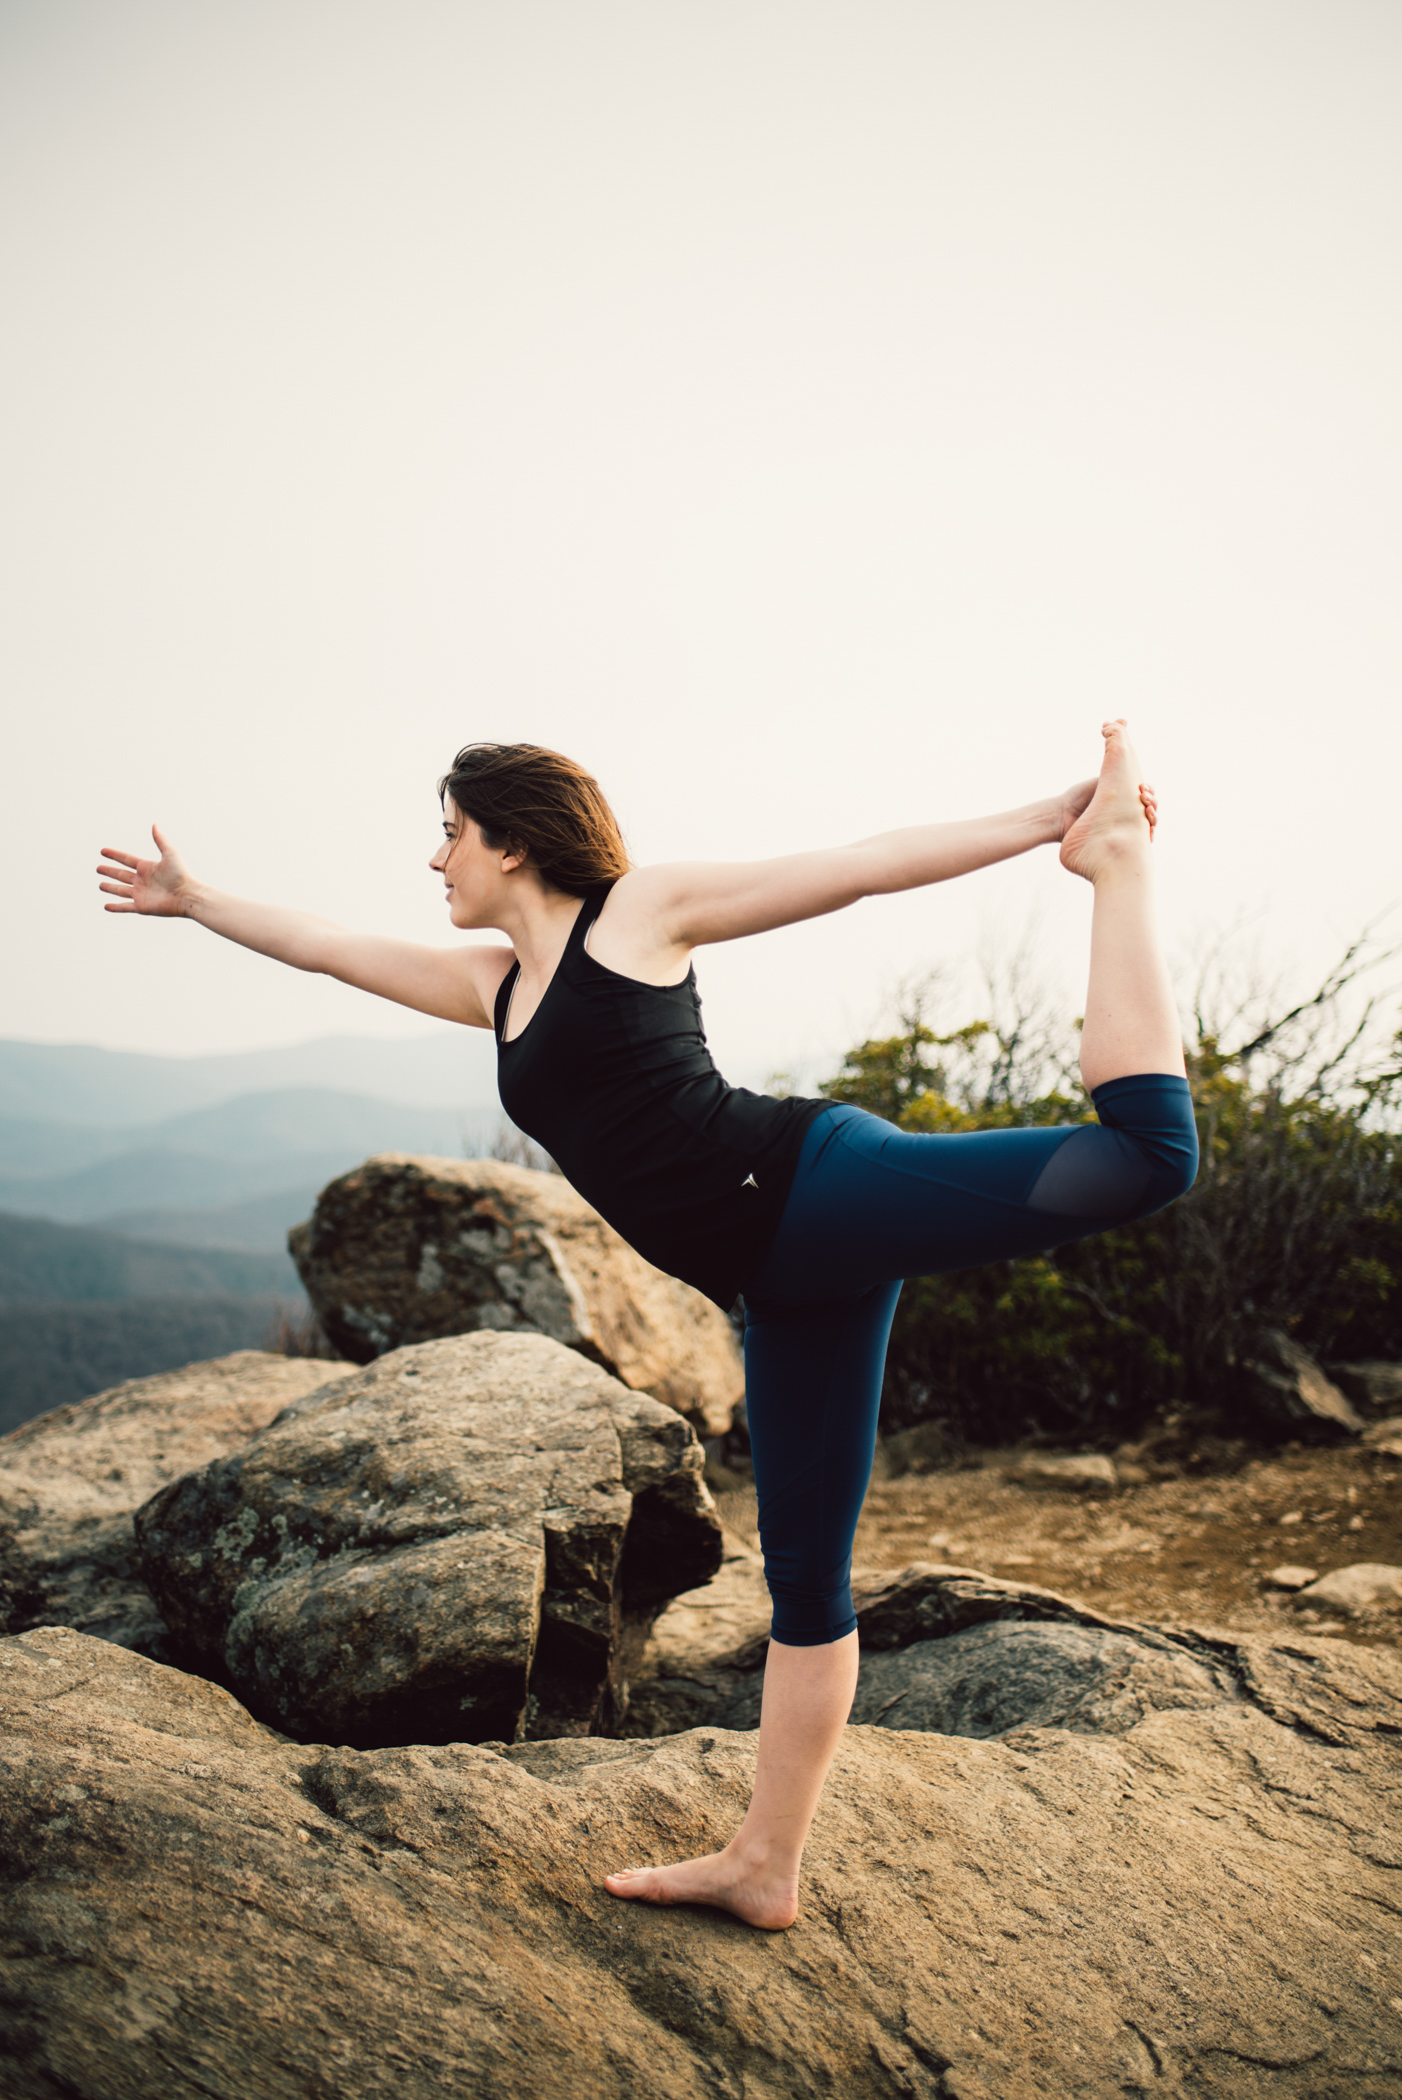 Yoga Mountain Top Yoga Portraits at Shenandoah National Park_5.JPG